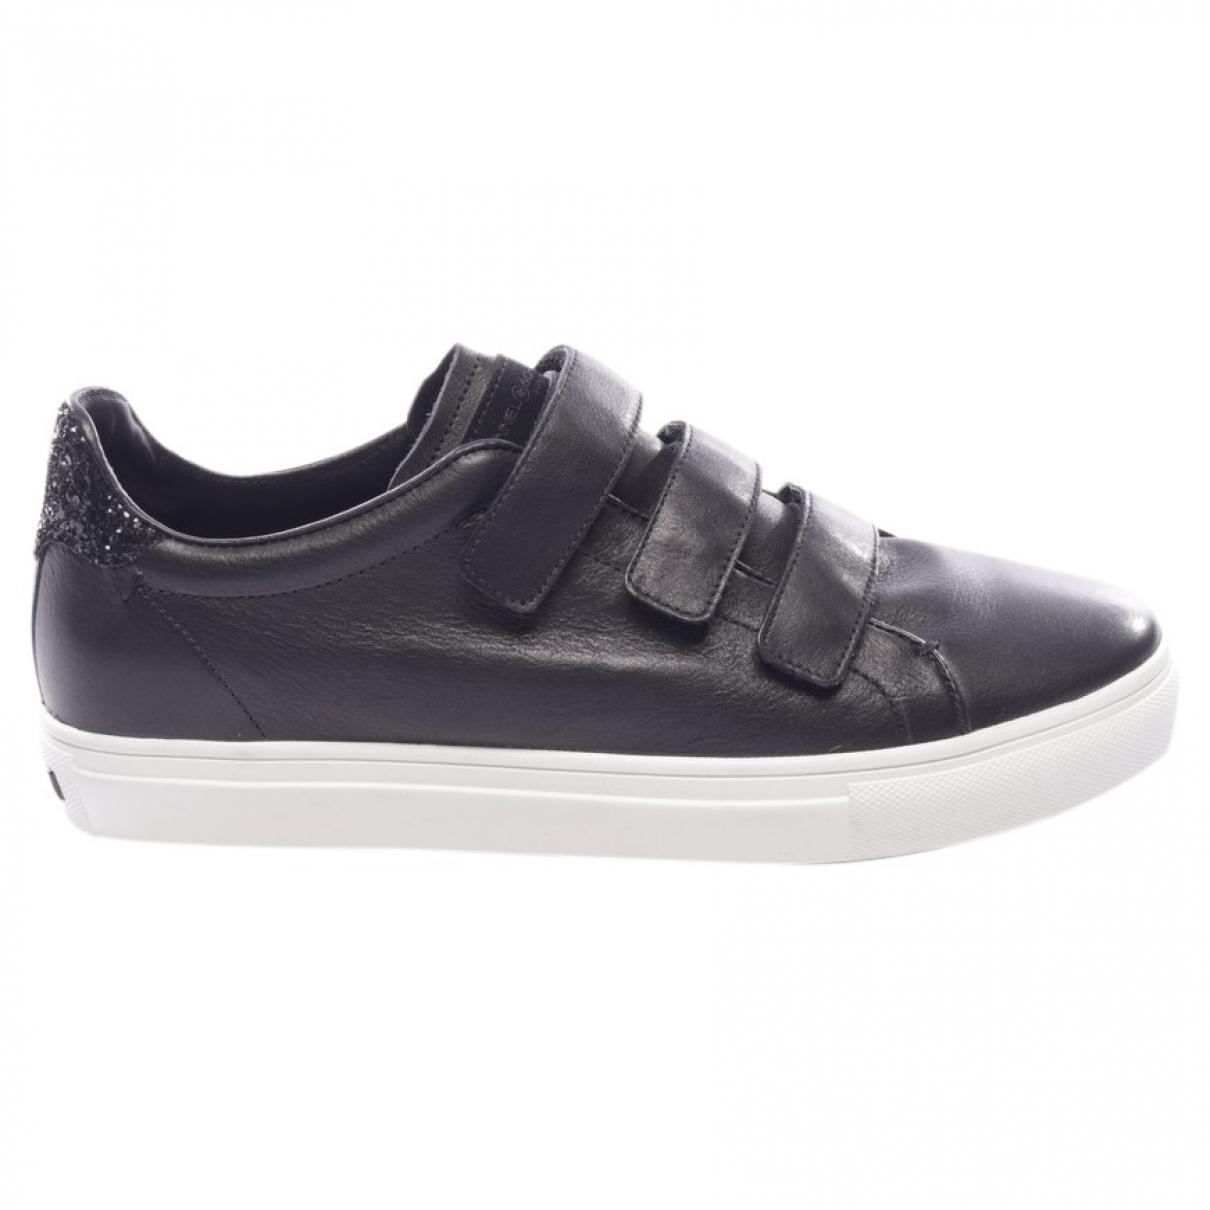 Kennel Und Schmenger \N Black Exotic leathers Flats for Women 41.5 EU